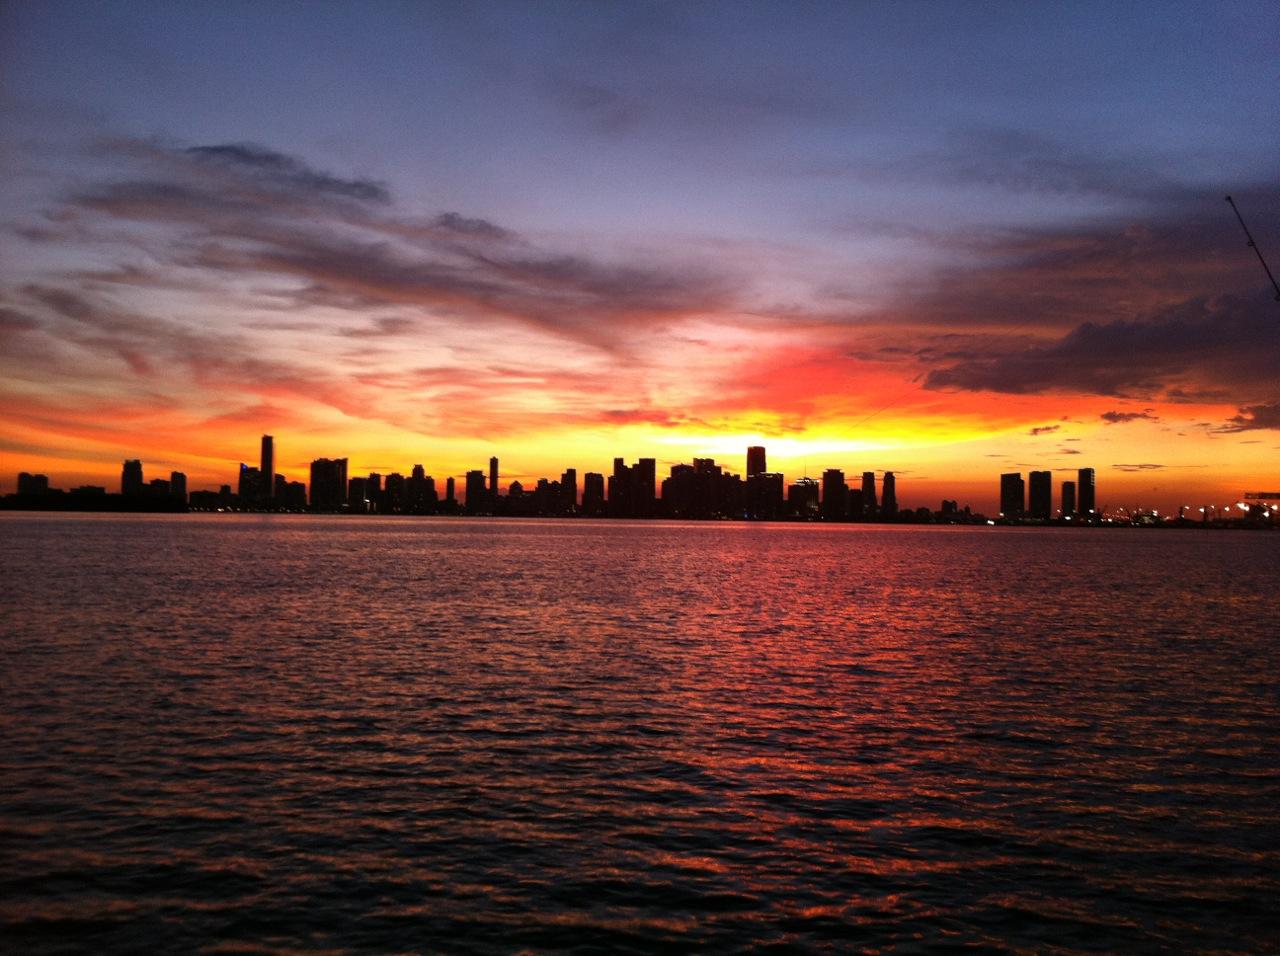 Sunset Fort Lauderdale - Miami